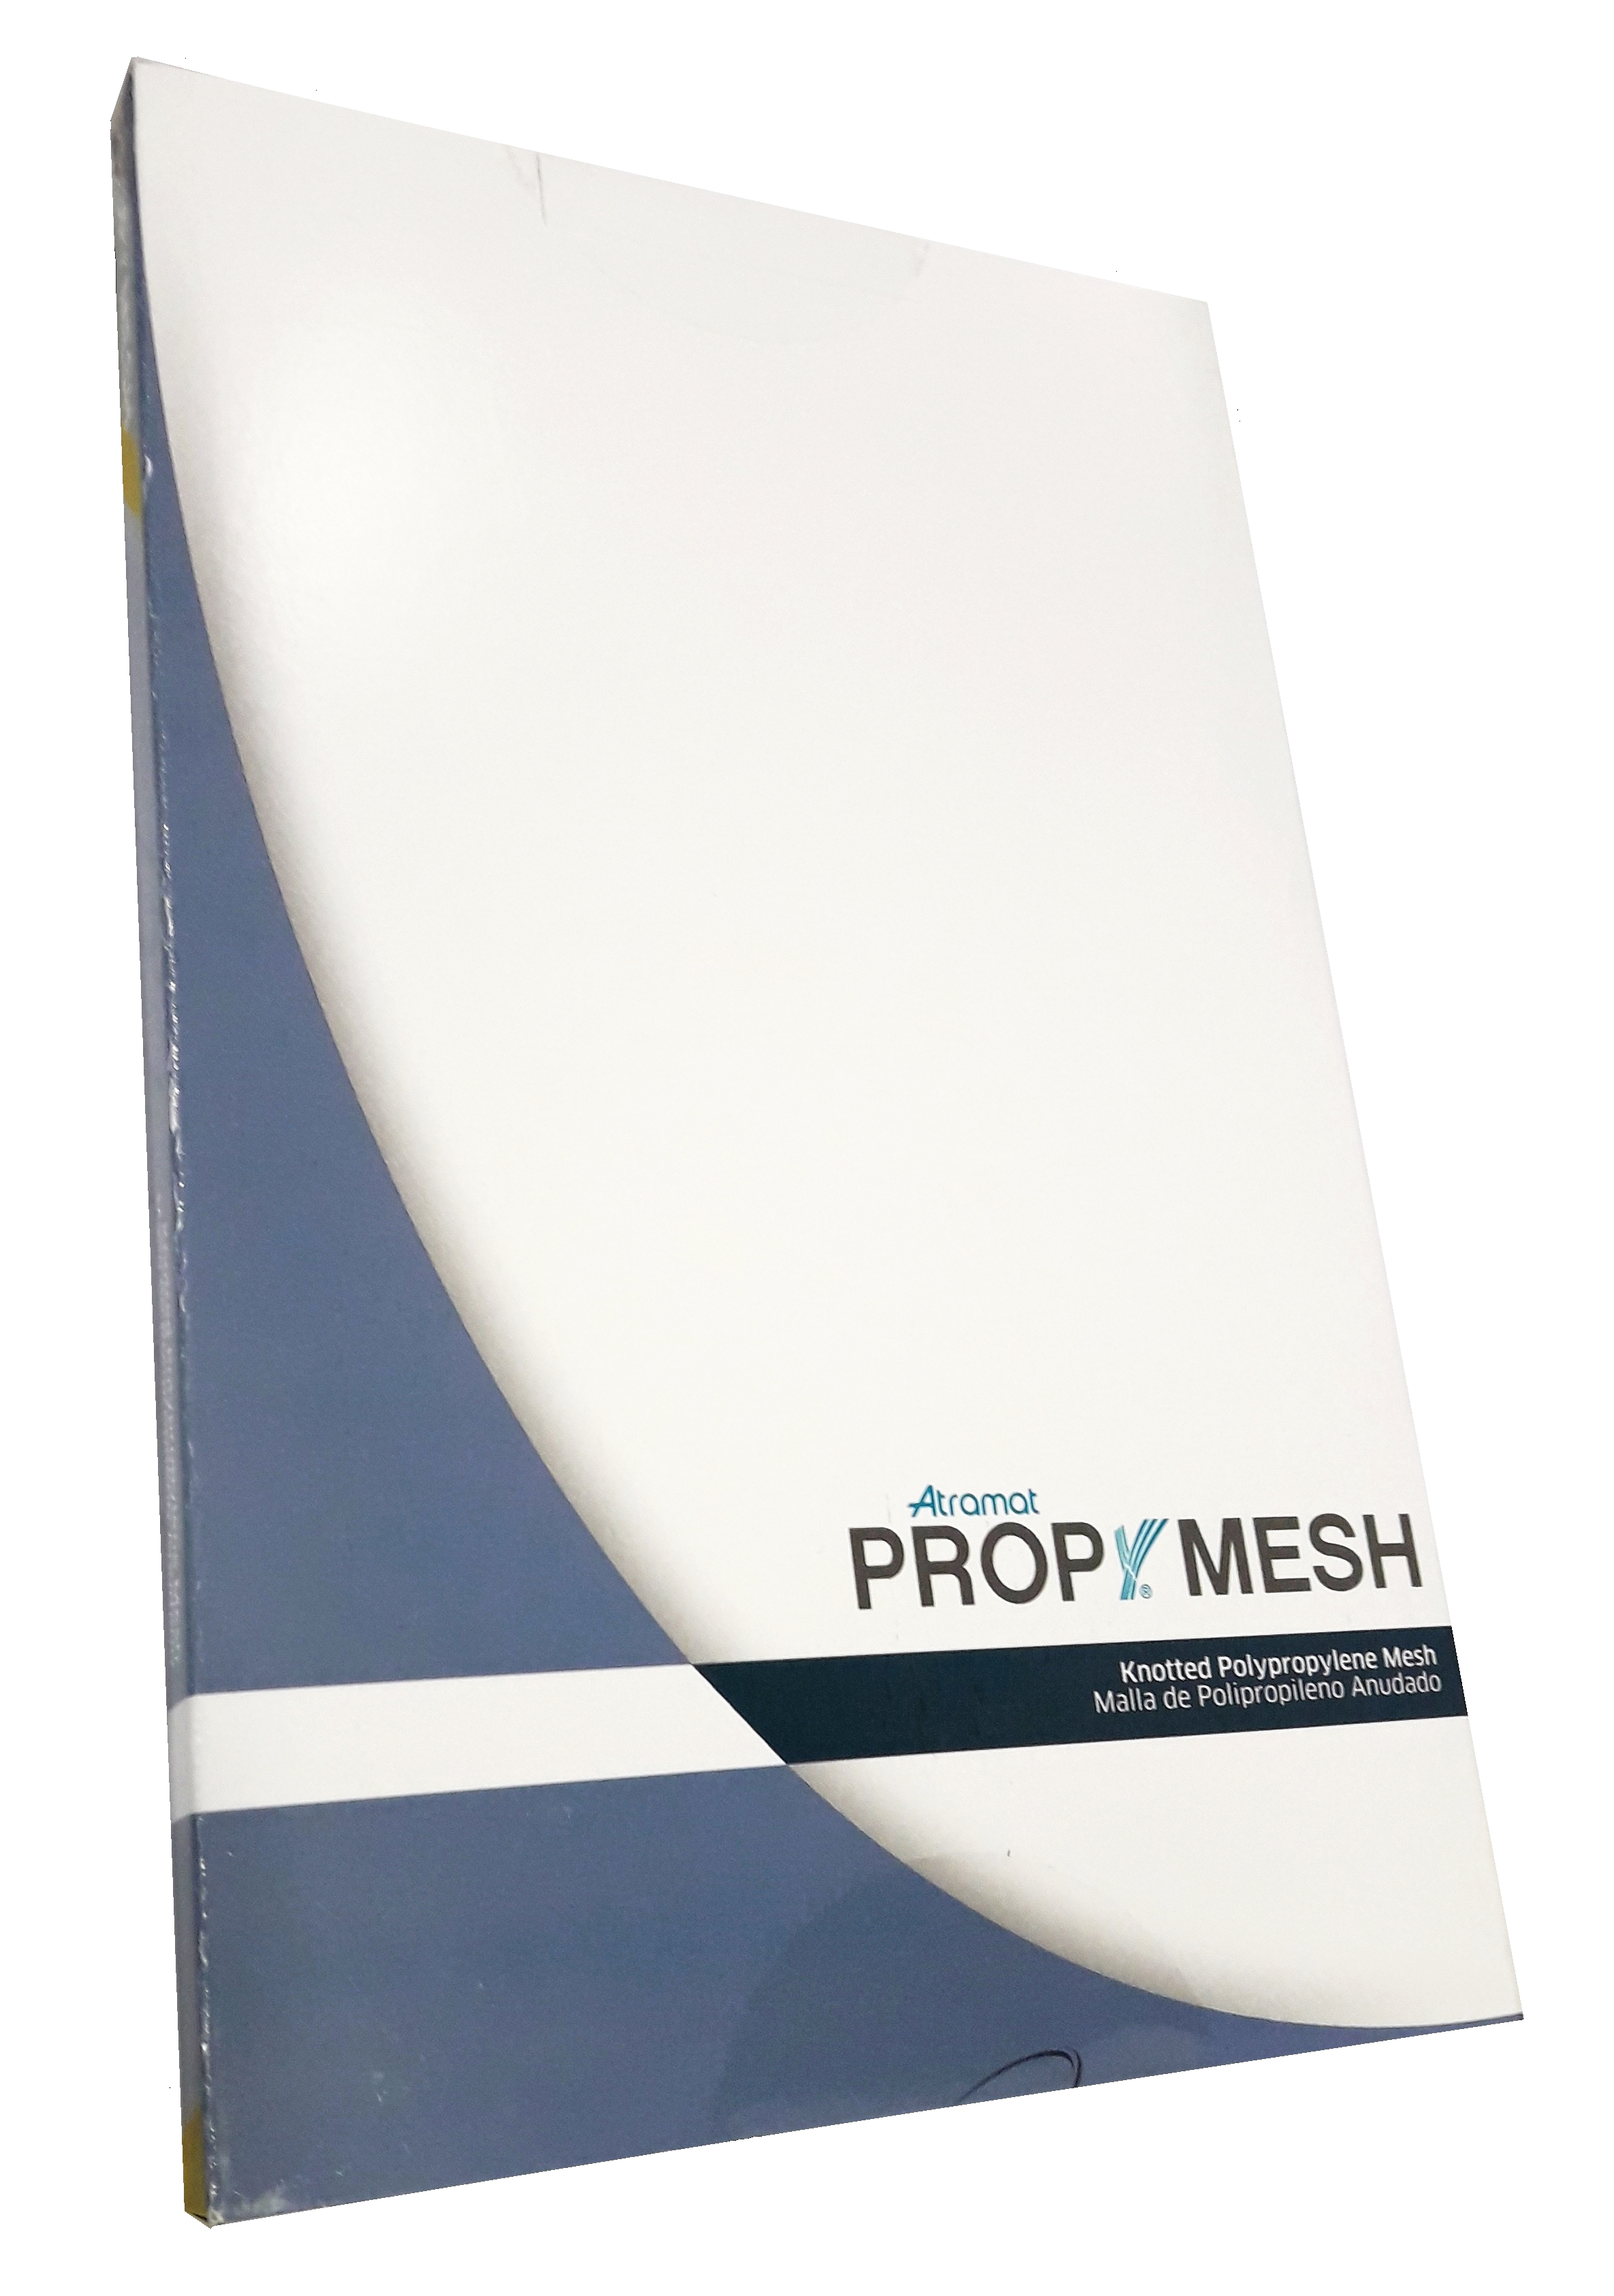 MALLA QUIR. POLIPROP. MONOF. PROPY MESH 8 X 15 CM.